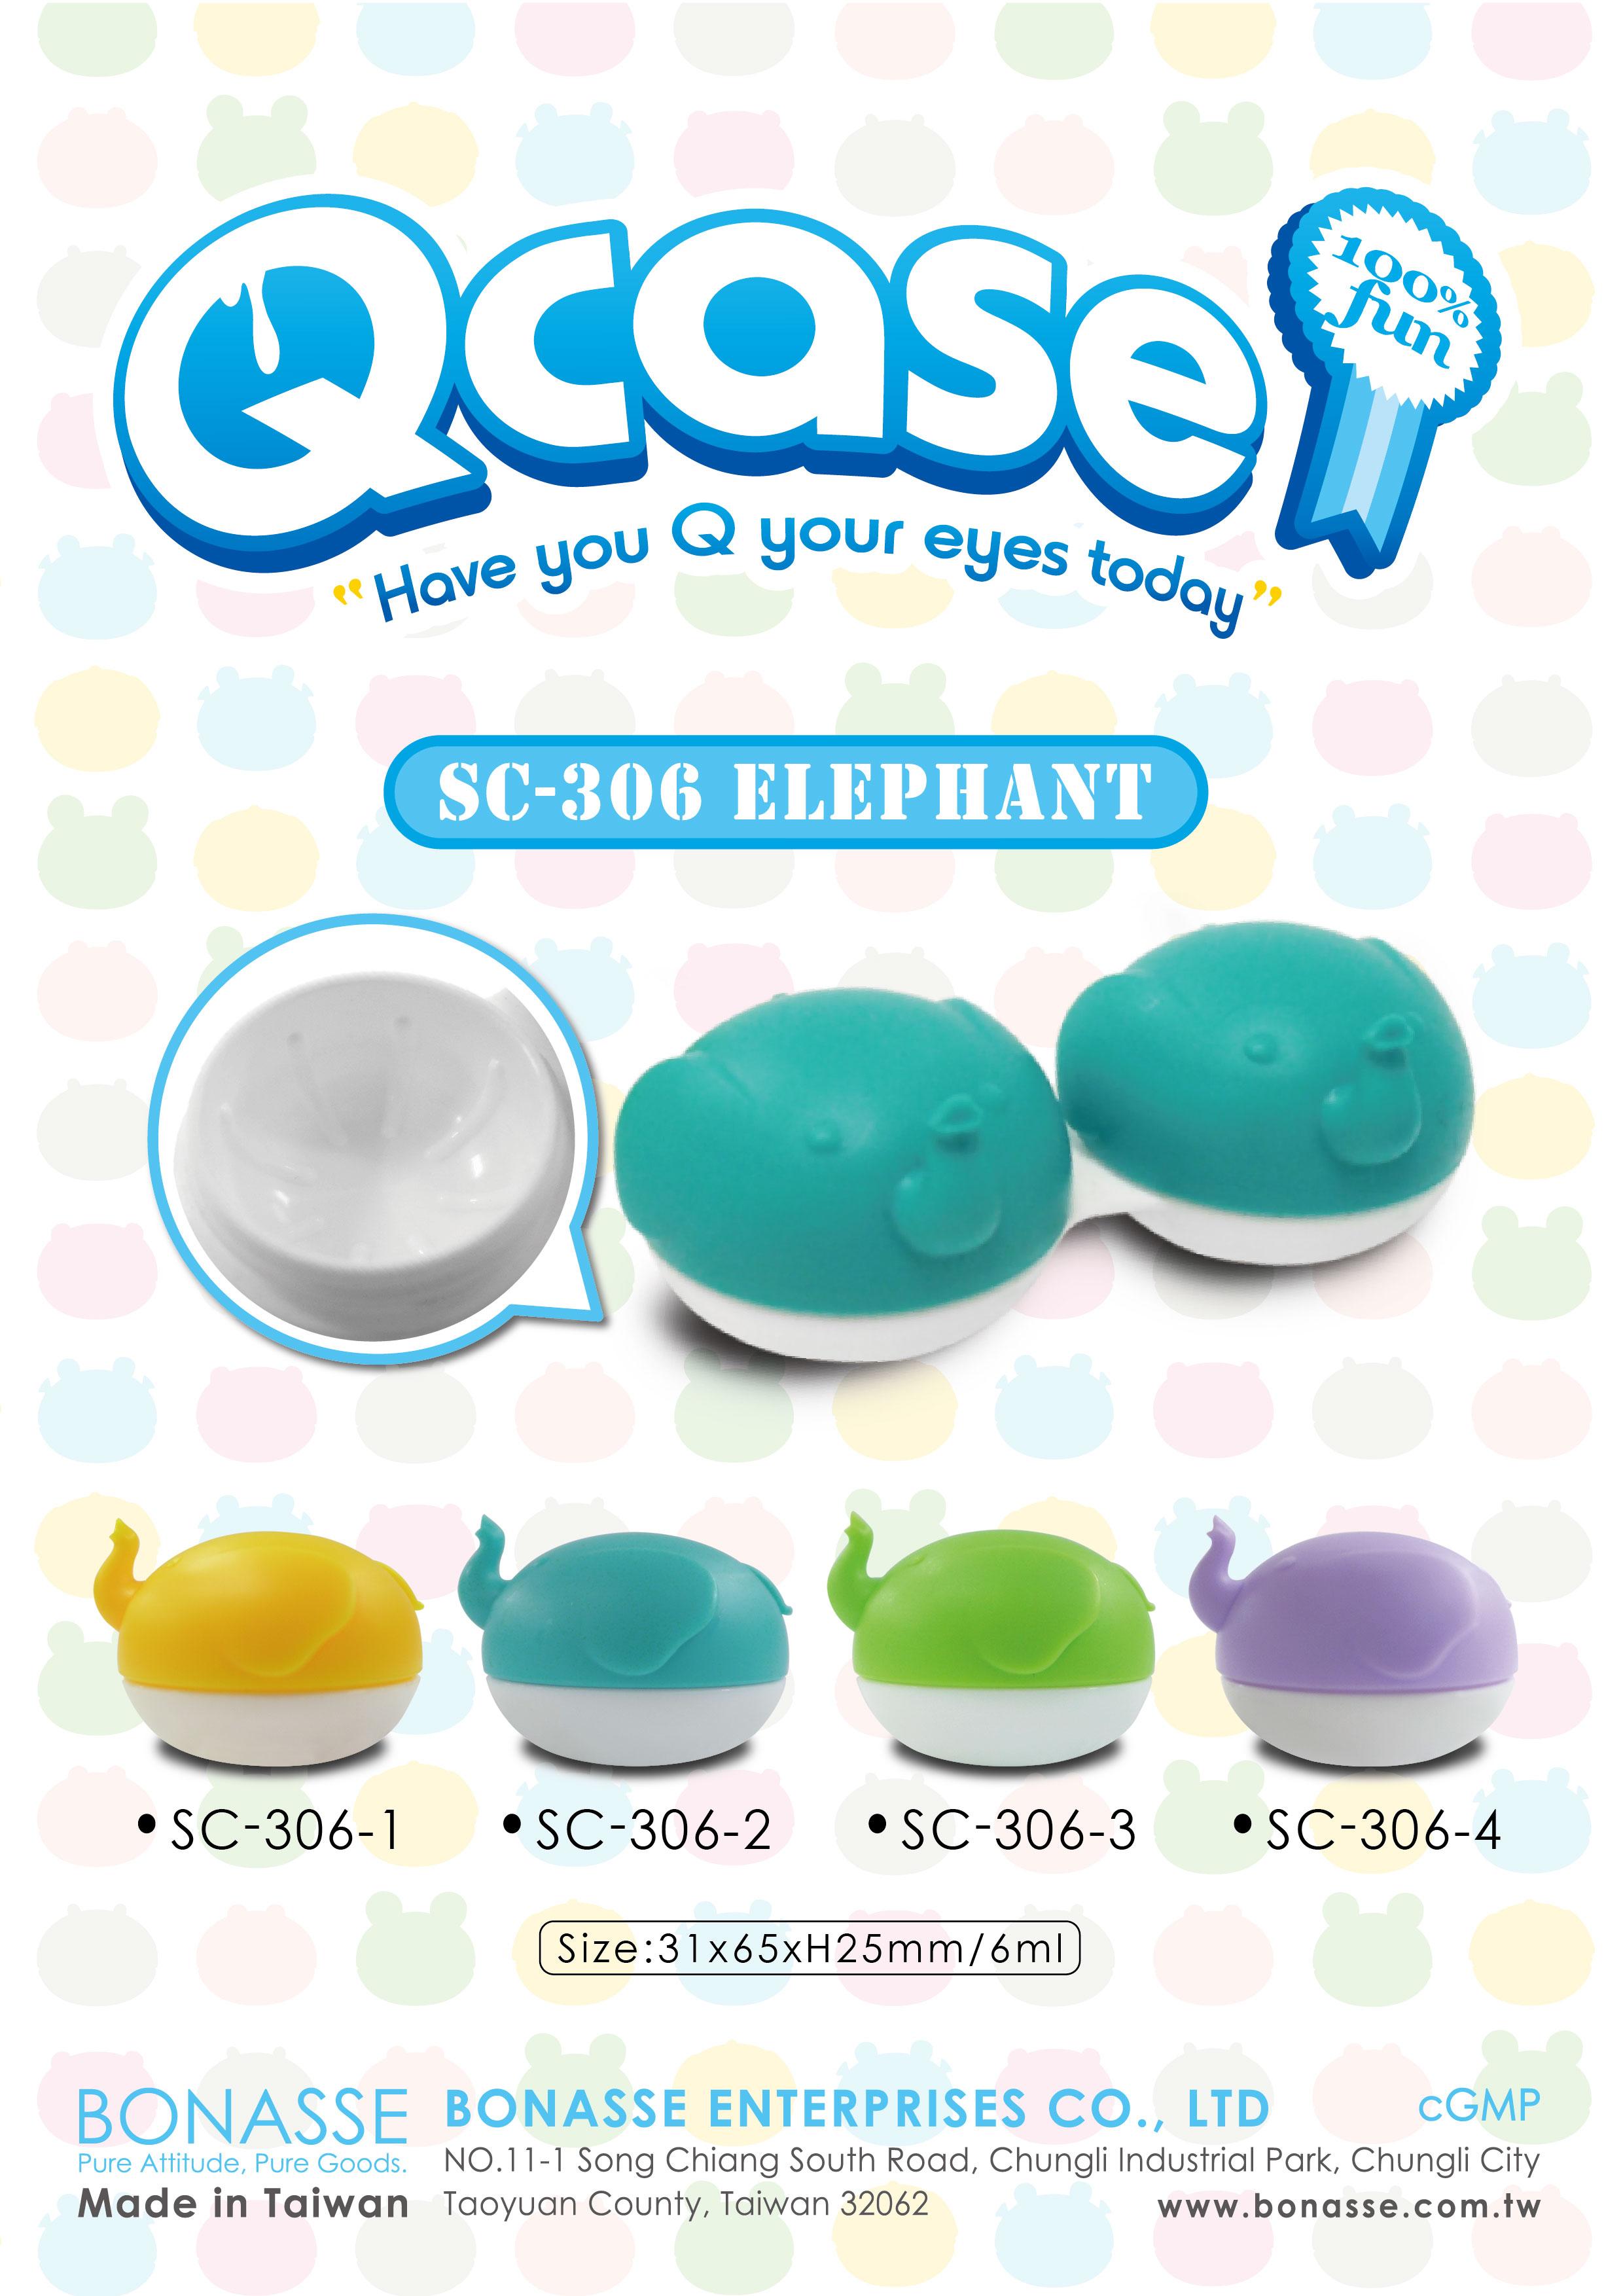 SC-306 ELEPHANT